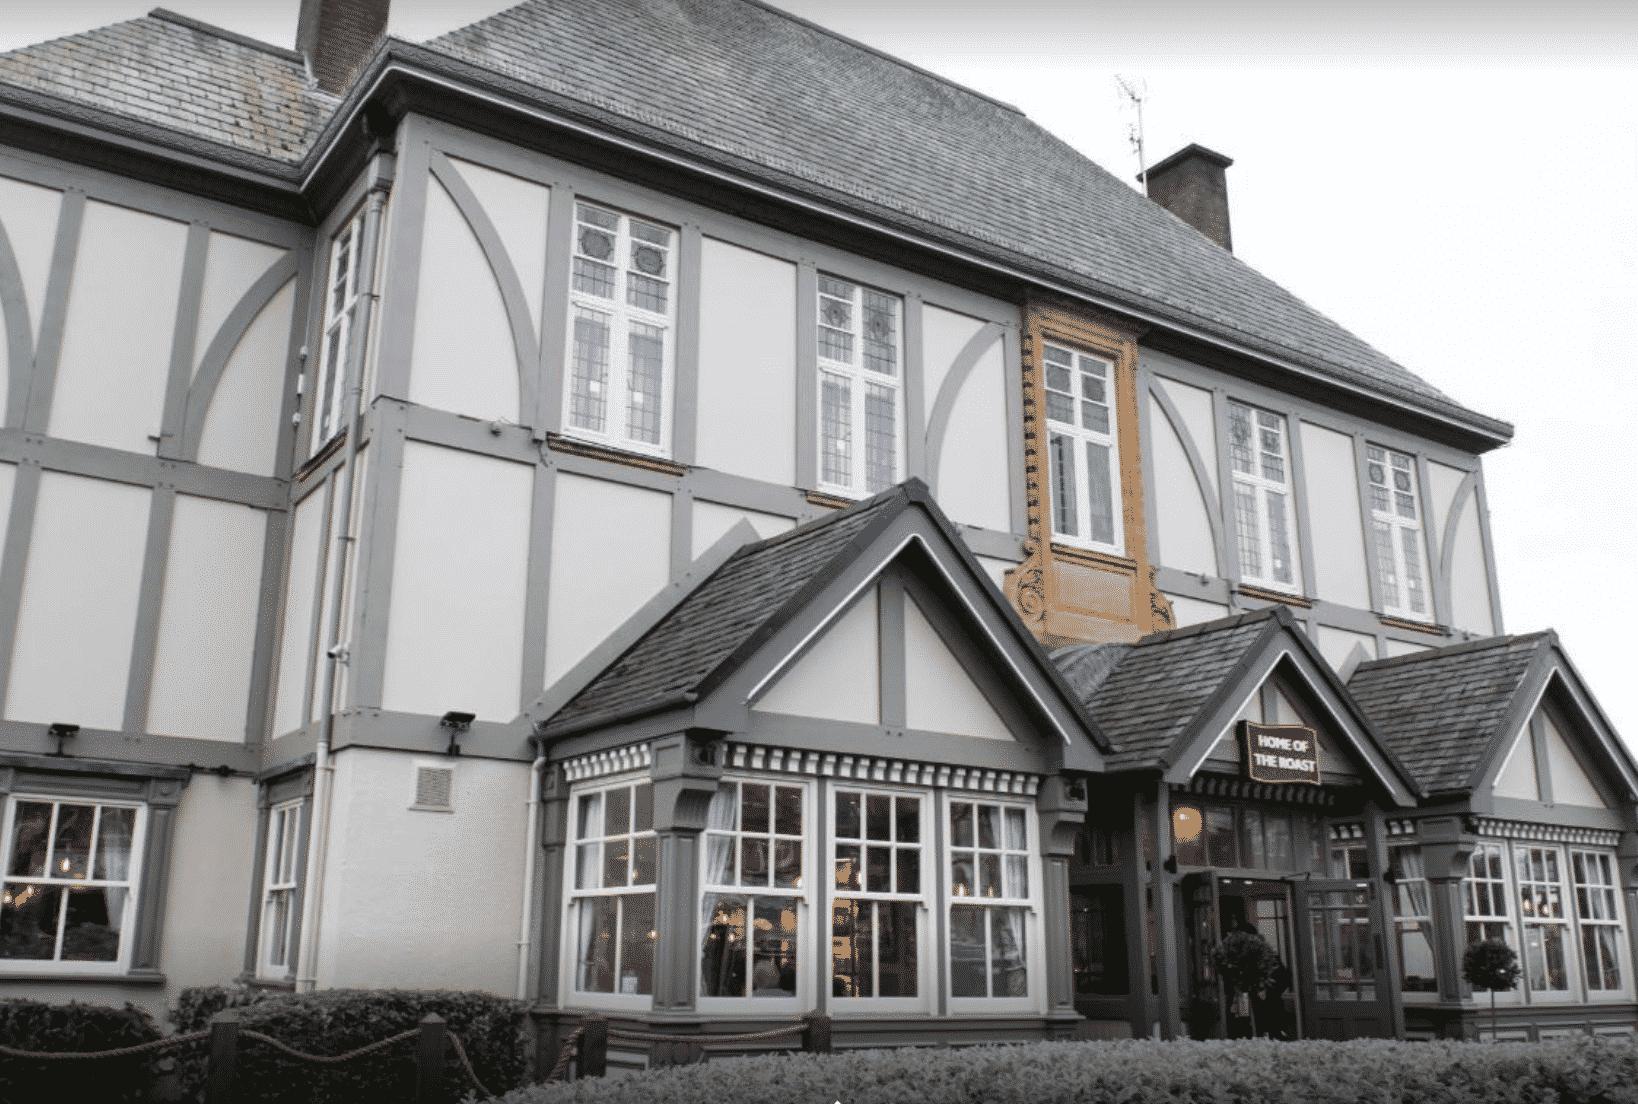 Innkeeper's Lodge Birmingham